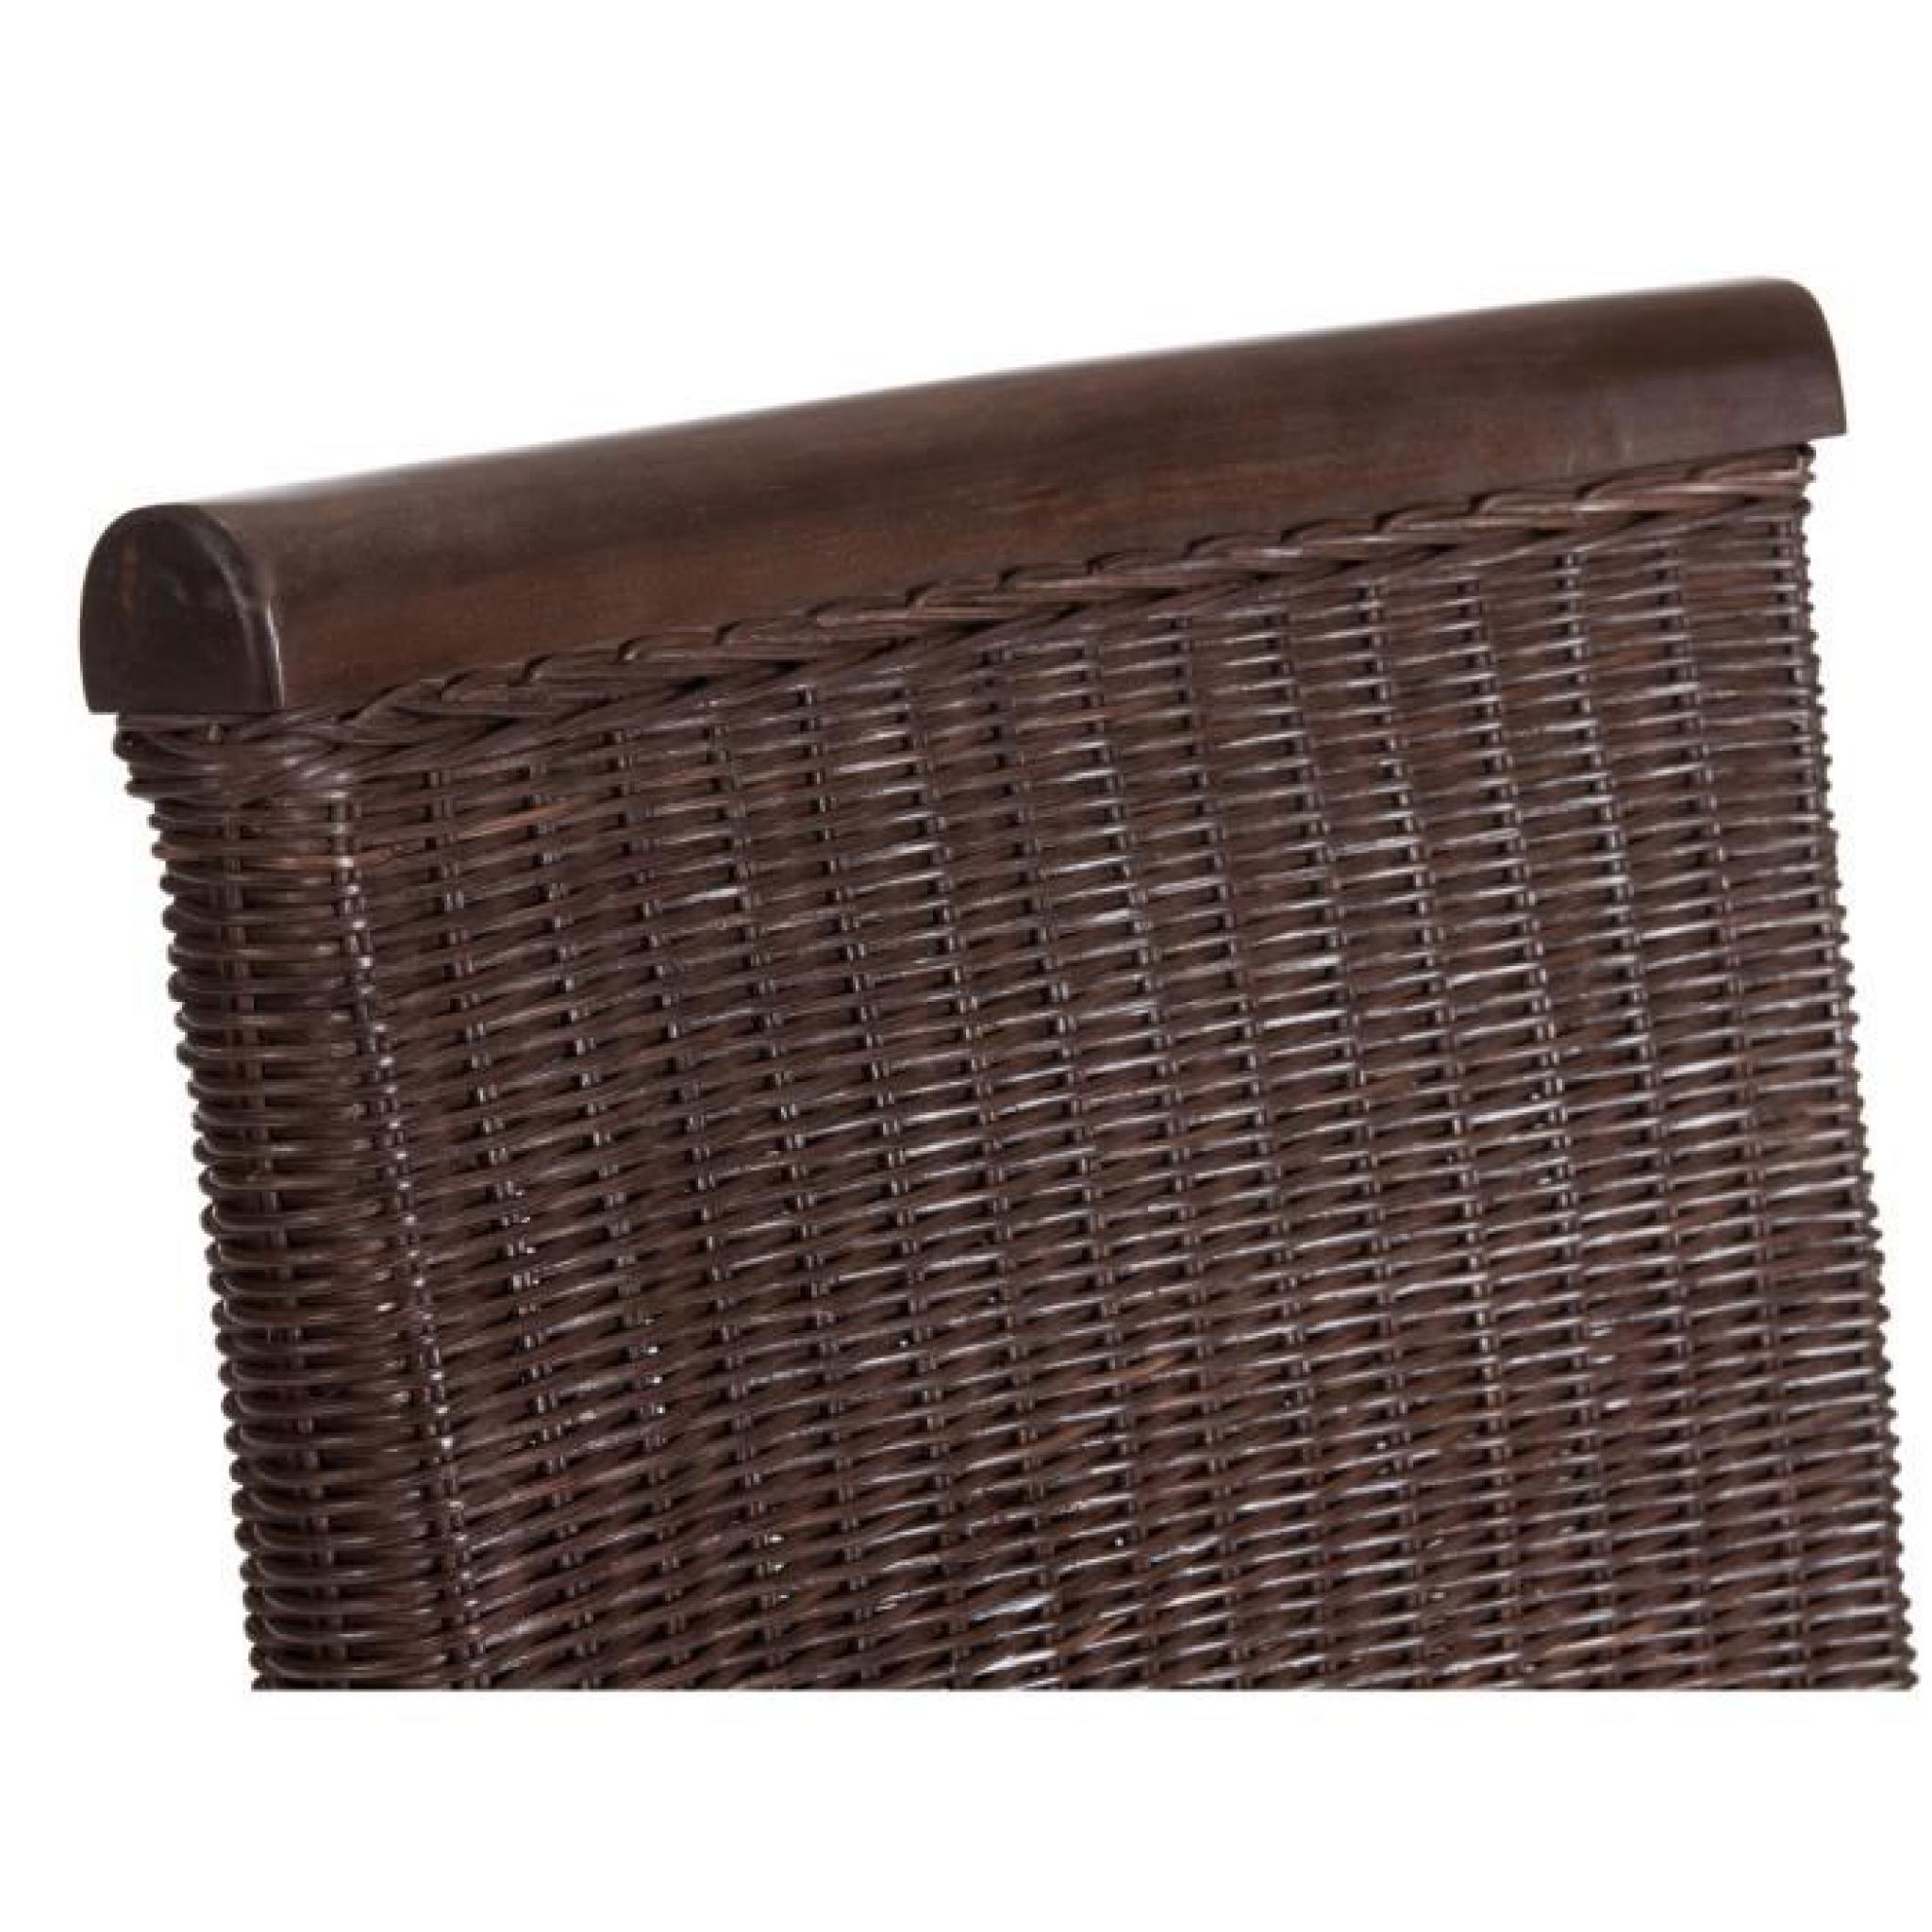 Chaise bologne ii en rotin colonial massivum achat vente Chaise de salle a manger en rotin pas cher